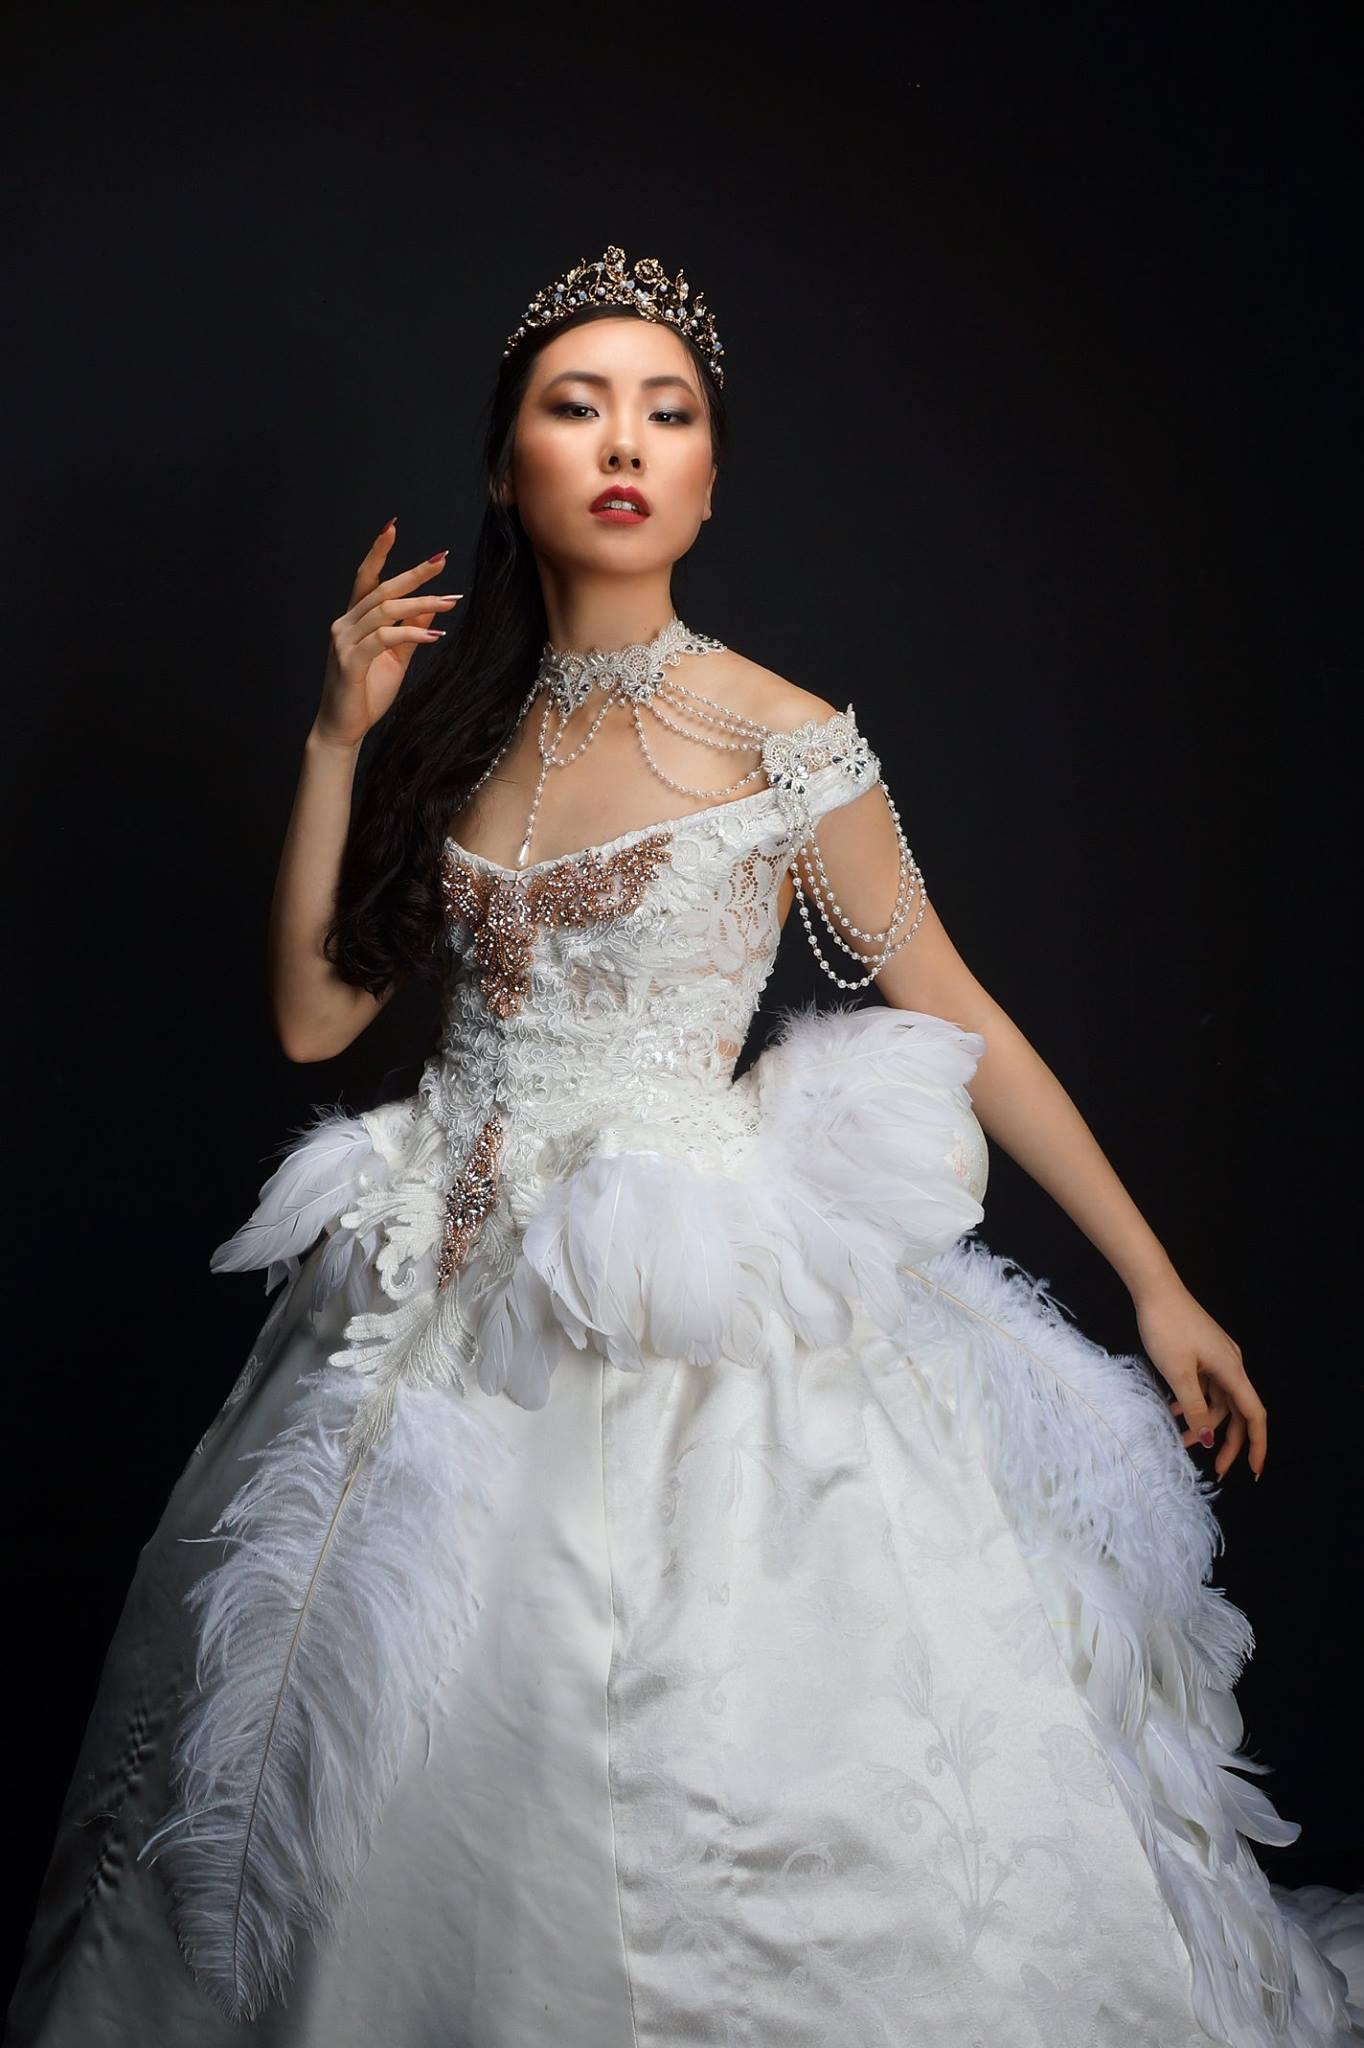 Model: Chrissy Chang- Dress: Justina Price MUA: Axcel Evc Photographer: Barry Freeman